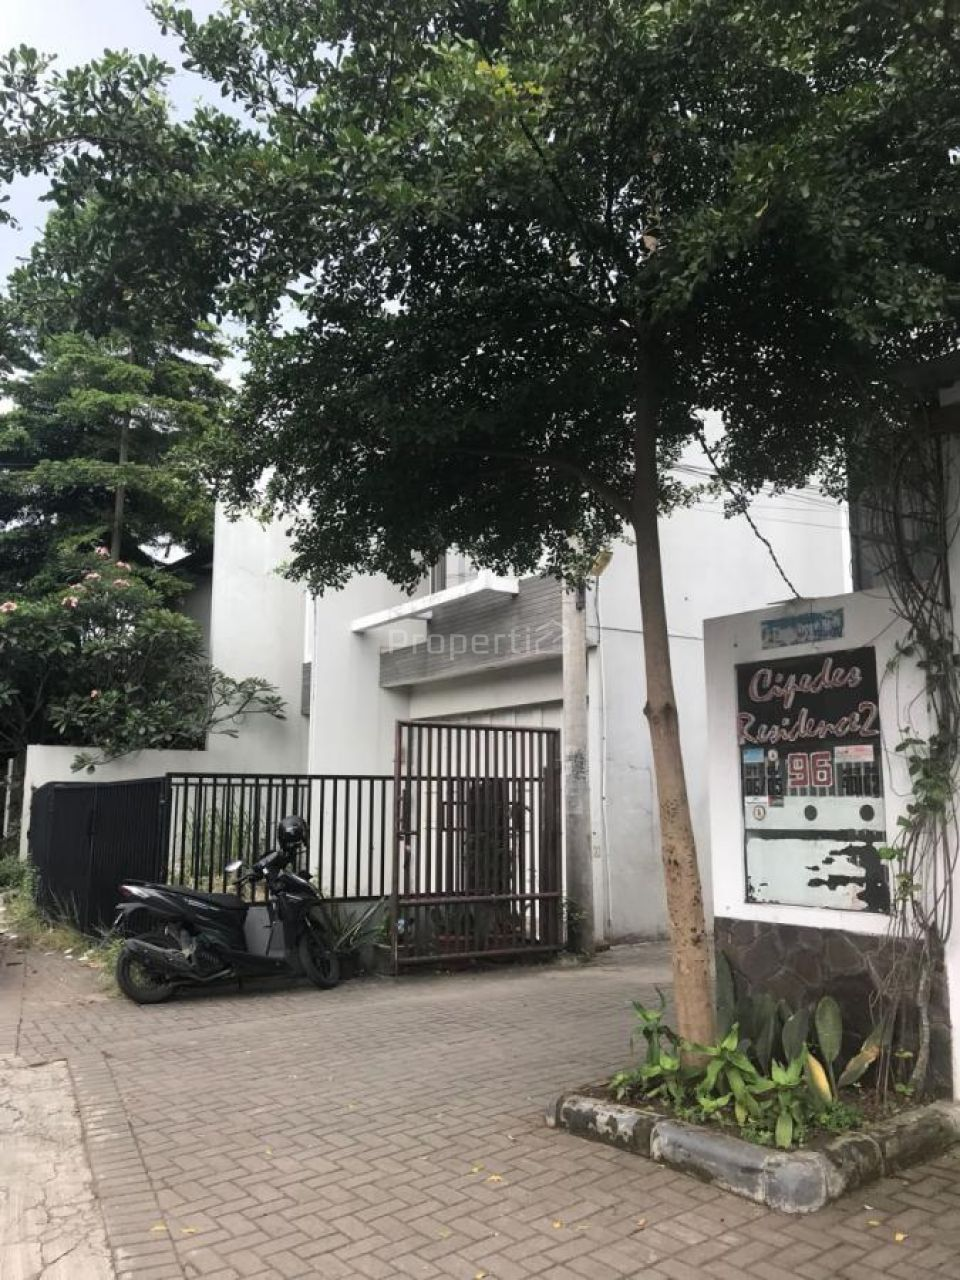 2 Storey Shophouse at Jl. Cipedes Tengah, Bandung City, Kota Bandung